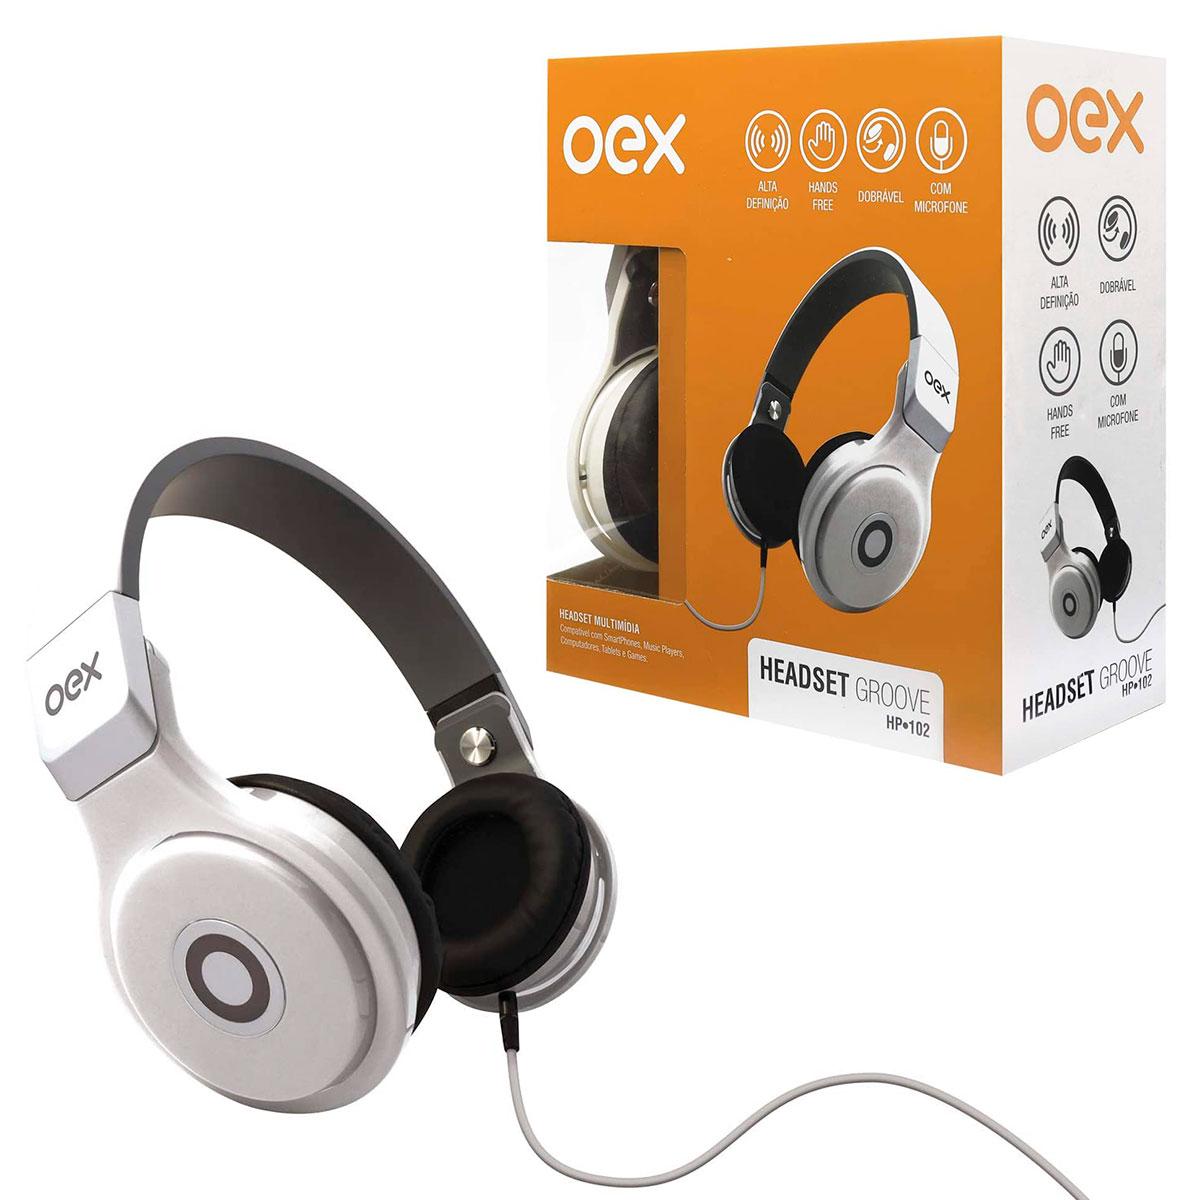 Fone de Ouvido OEX Groove HP102, P2 de 3.5mm, Branco - Dobrável, C/ Microfone